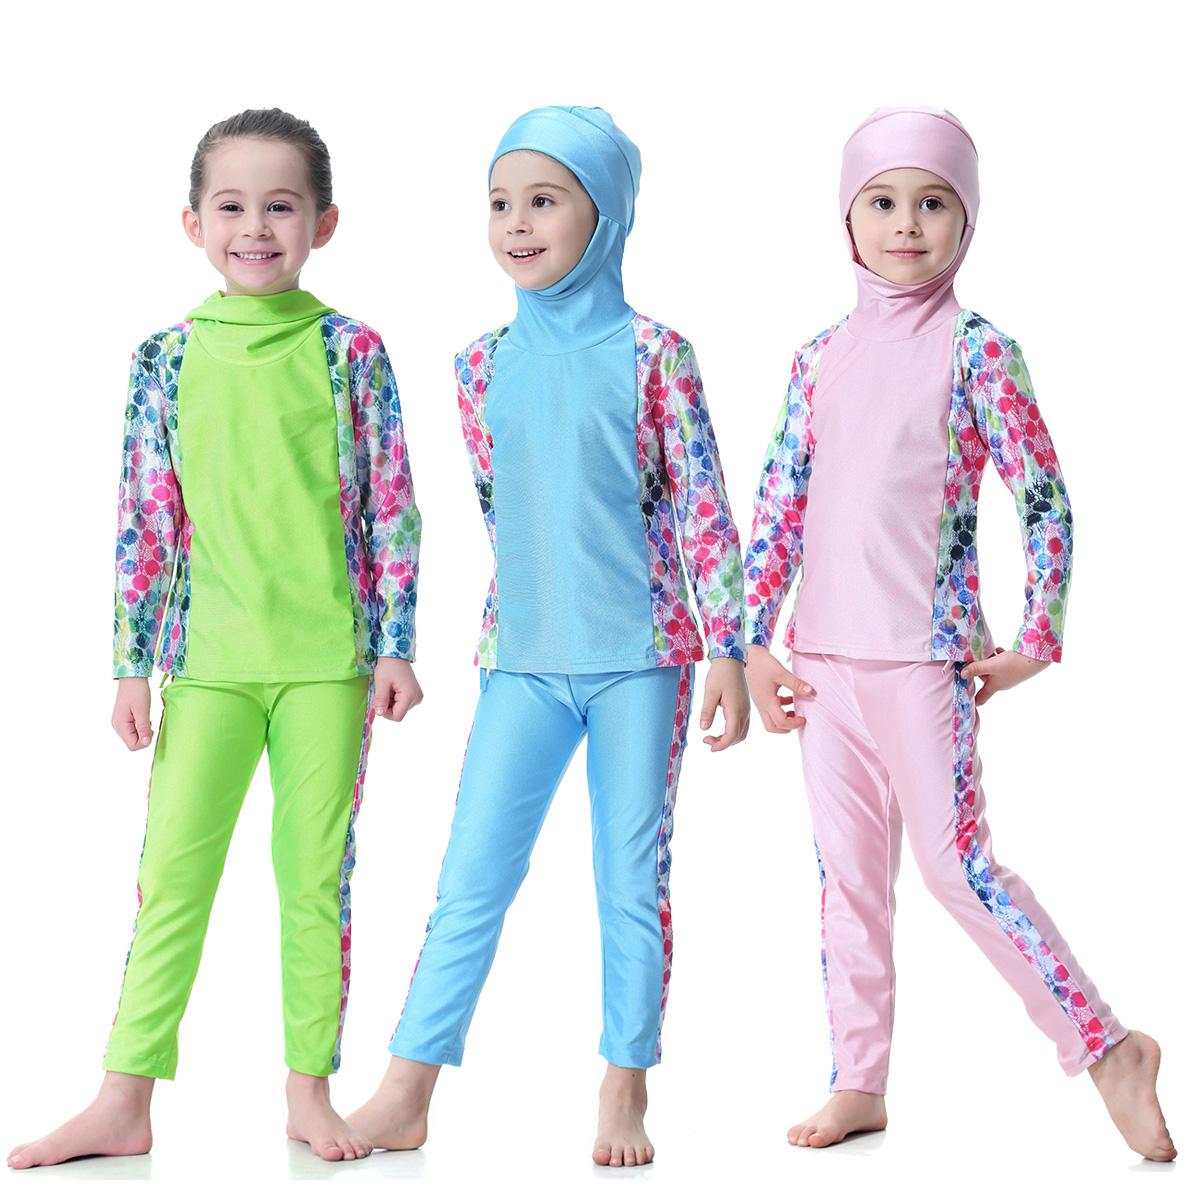 Kids Short Sleeve Swimsuit Muslim Islamic Two Piece Girl Modest Swimwear Swimsuits Colorful Print Rash Guard Sets